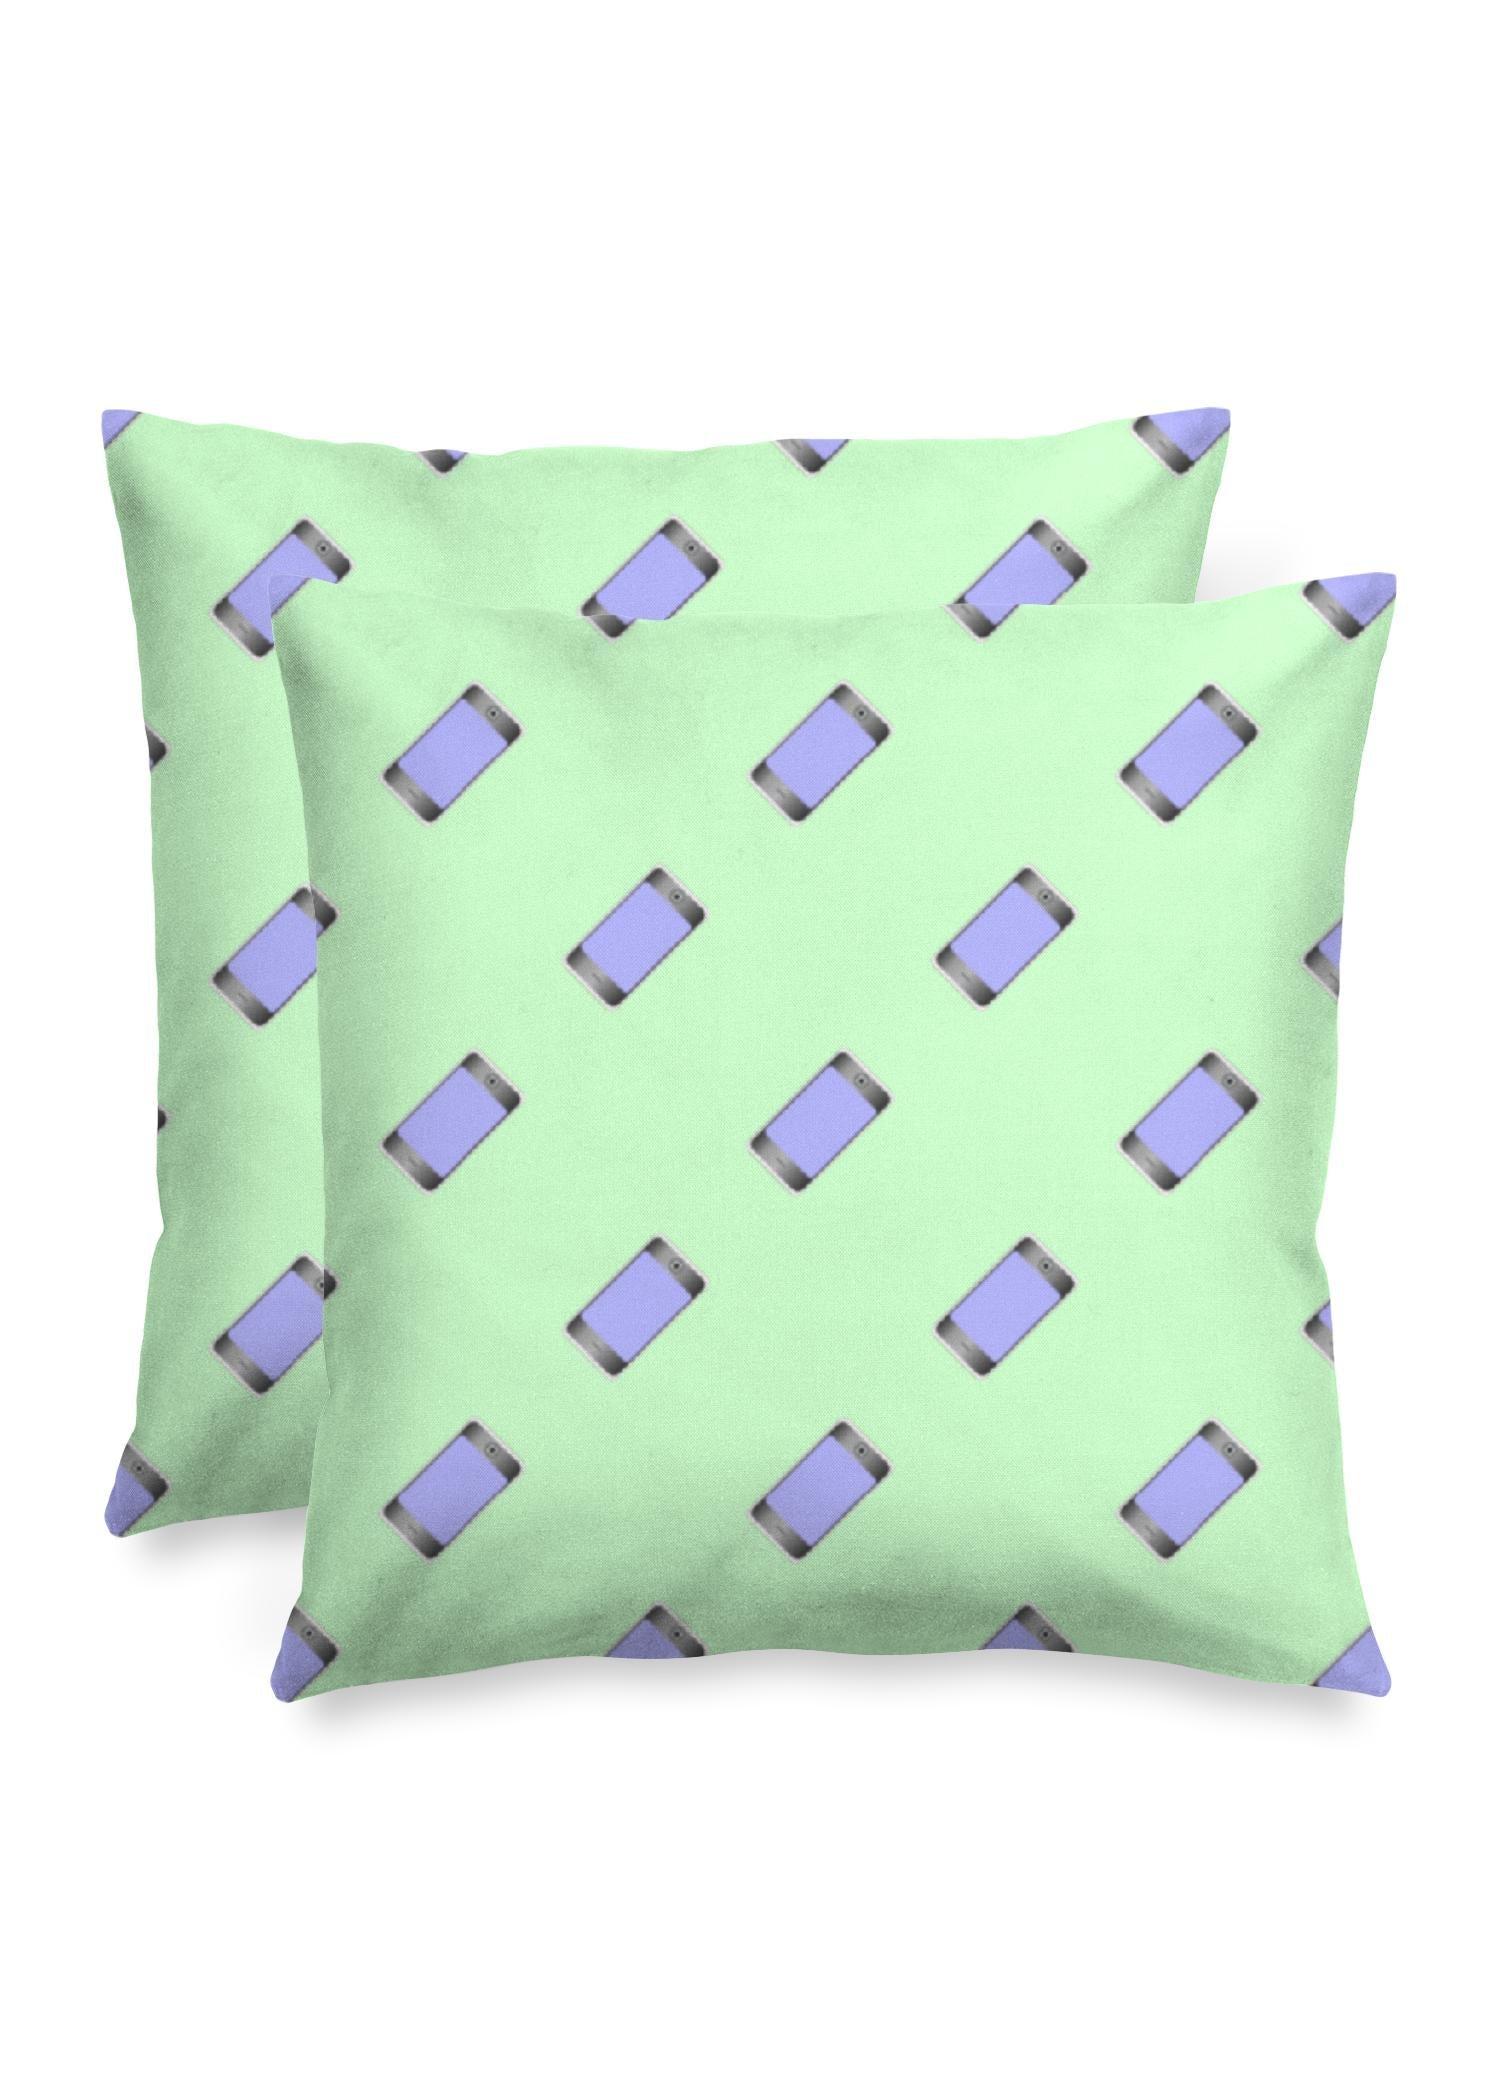 "VIDA Square Pillow - Mobile Phones On Green in Green by VIDA Original Artist  - Size: Matte / 16"" / Single"